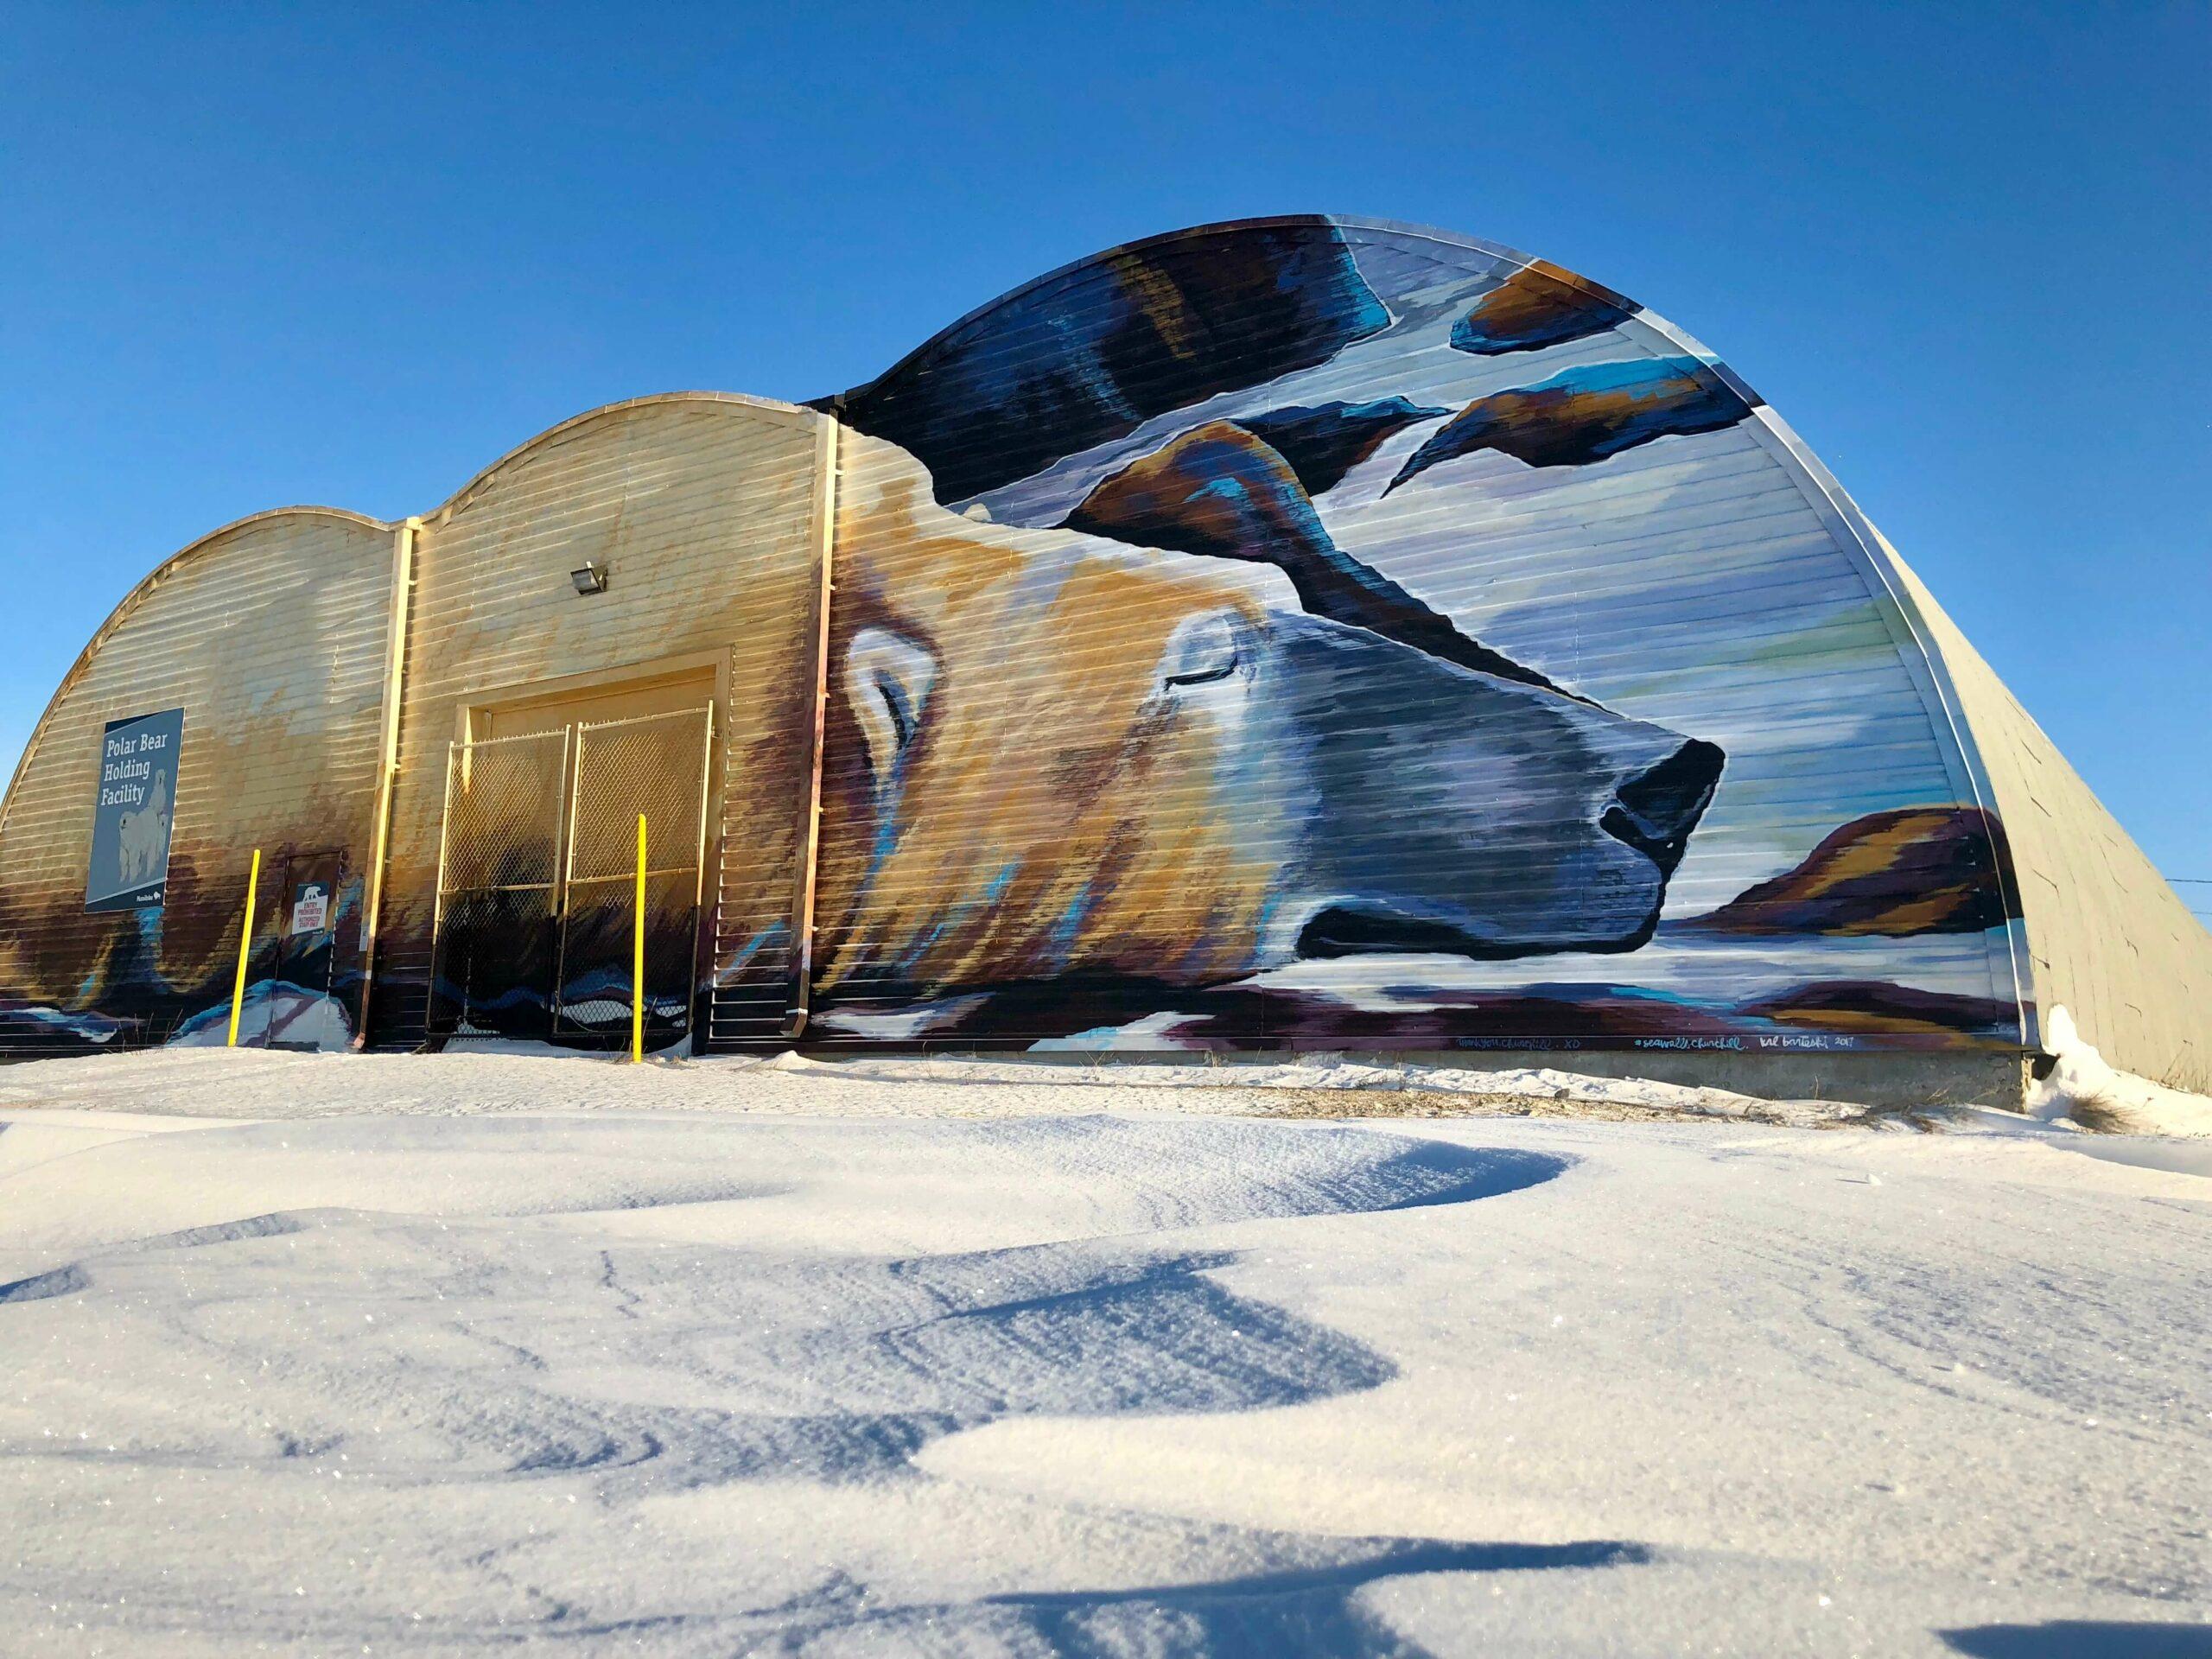 Outside of the Polar Bear holding facility decorated with a giant mural by Kal Bartesky, of a sleeping polar bear